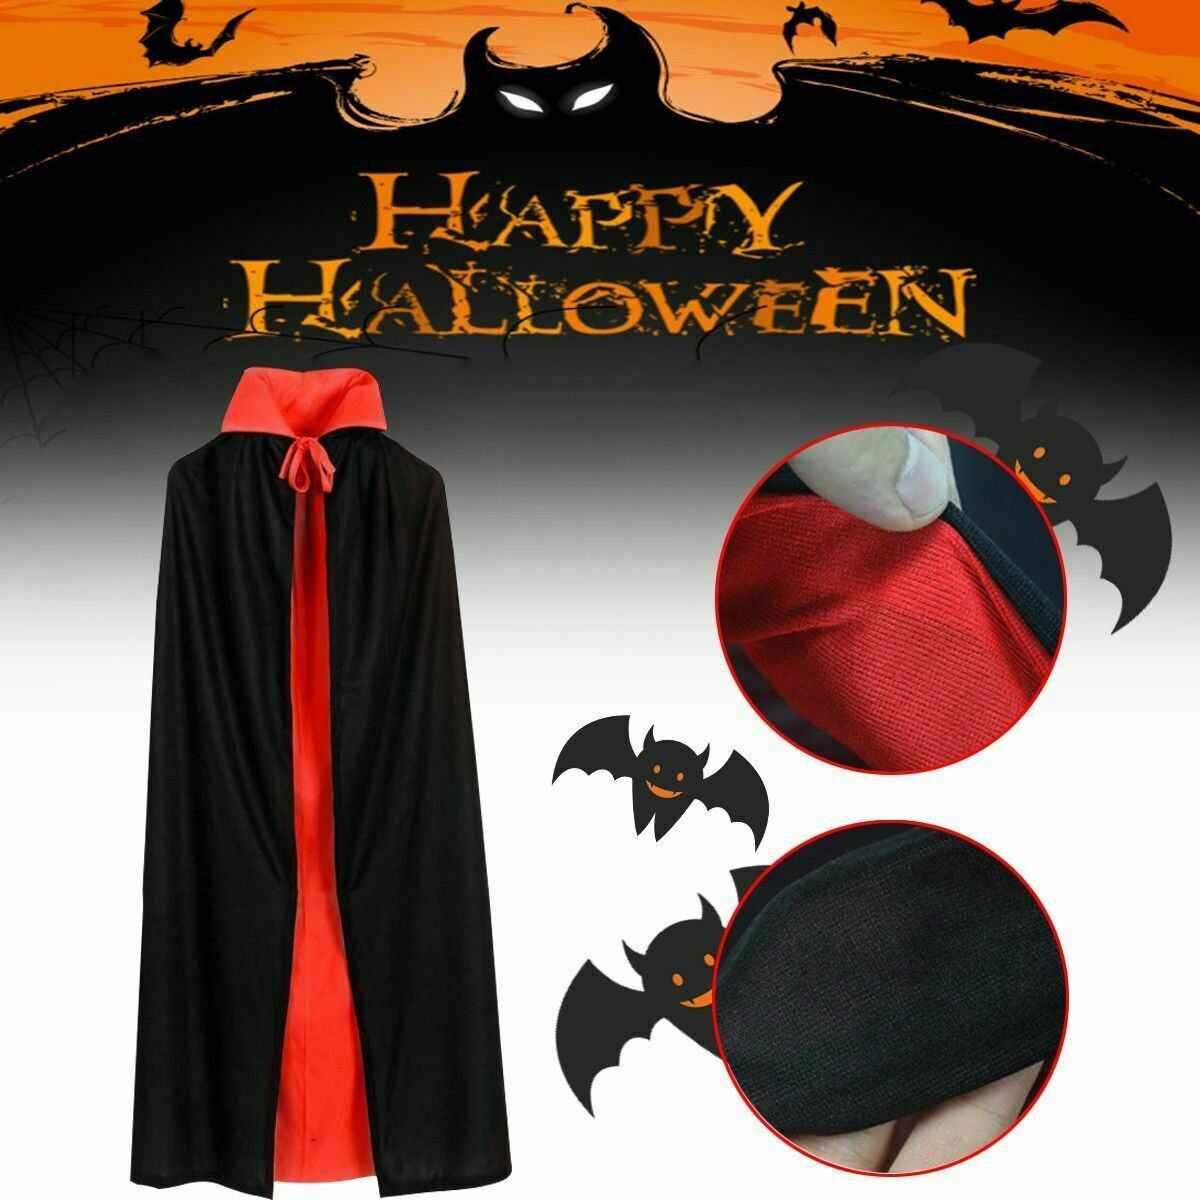 1x preto & vermelho halloween com capuz traje reversível manto capa homem mulher cosplay drácula diabo gótico bruxa princesa